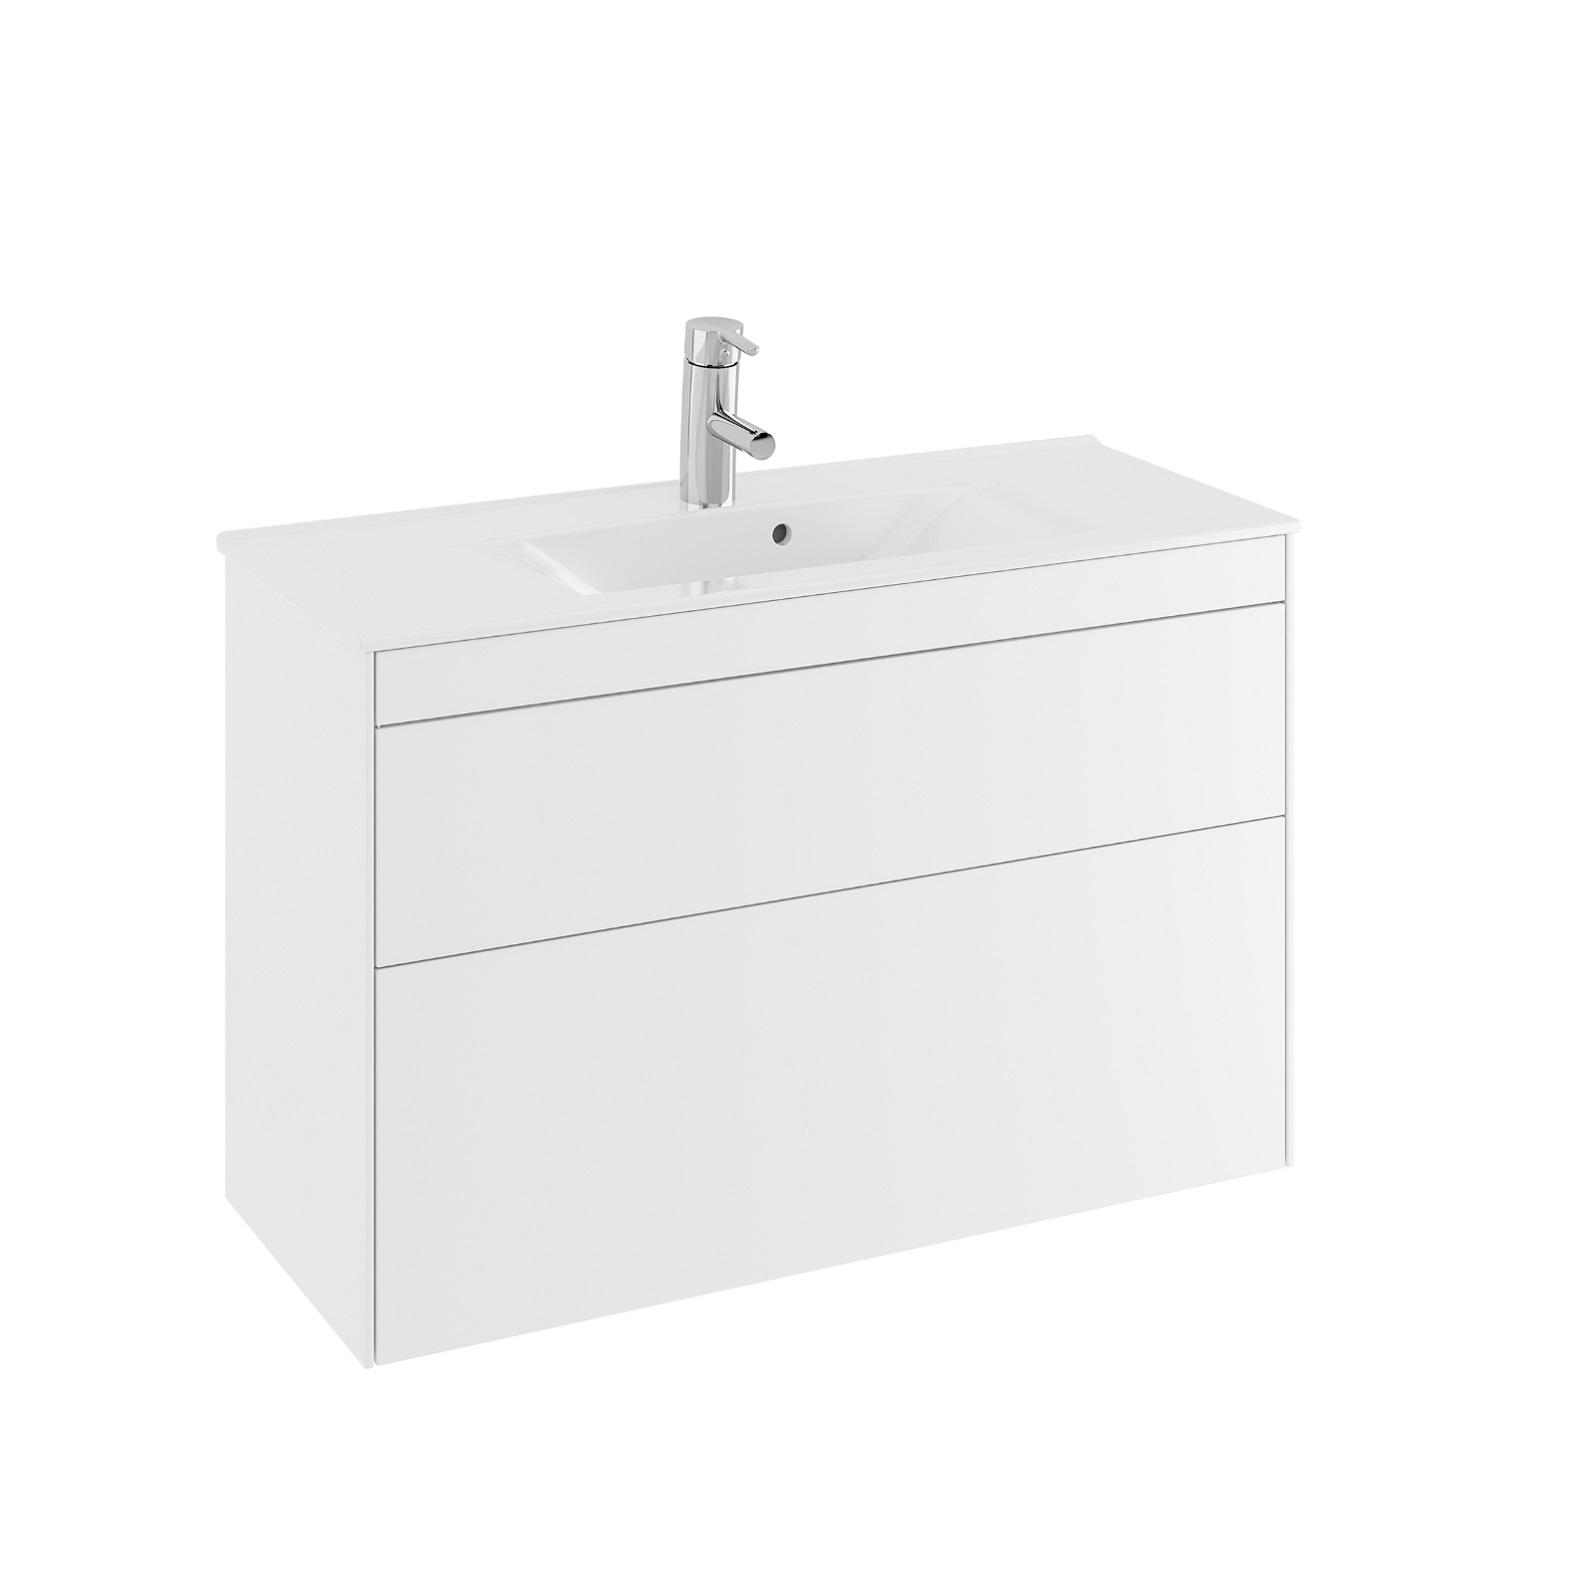 Tvättställsskåp Ifö Sense SSMP Compact